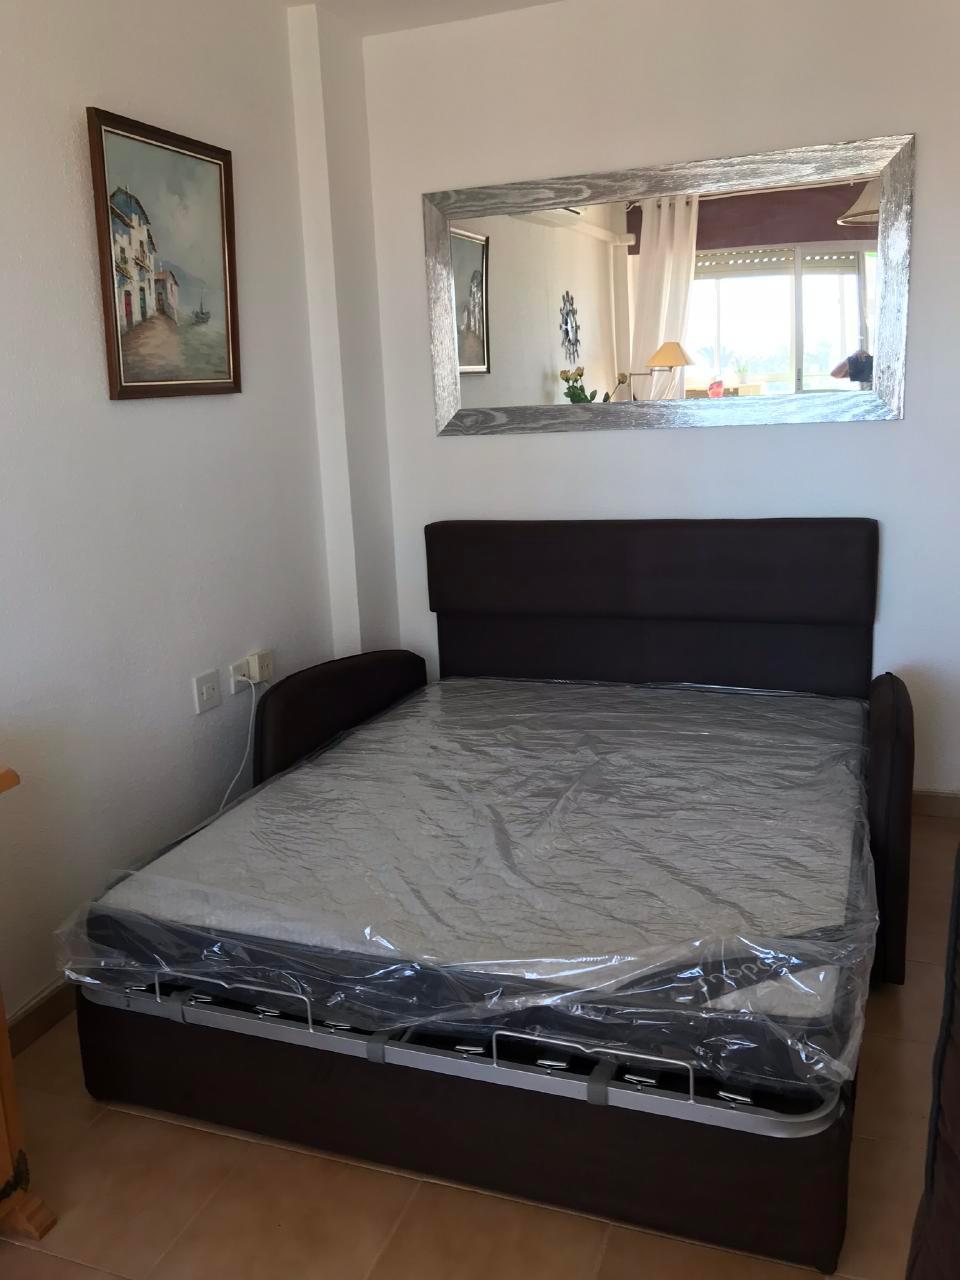 Appartement de vacances Sonnige 3.5 Zi-Wohnung am Meer (1026876), Torrevieja, Costa Blanca, Valence, Espagne, image 10